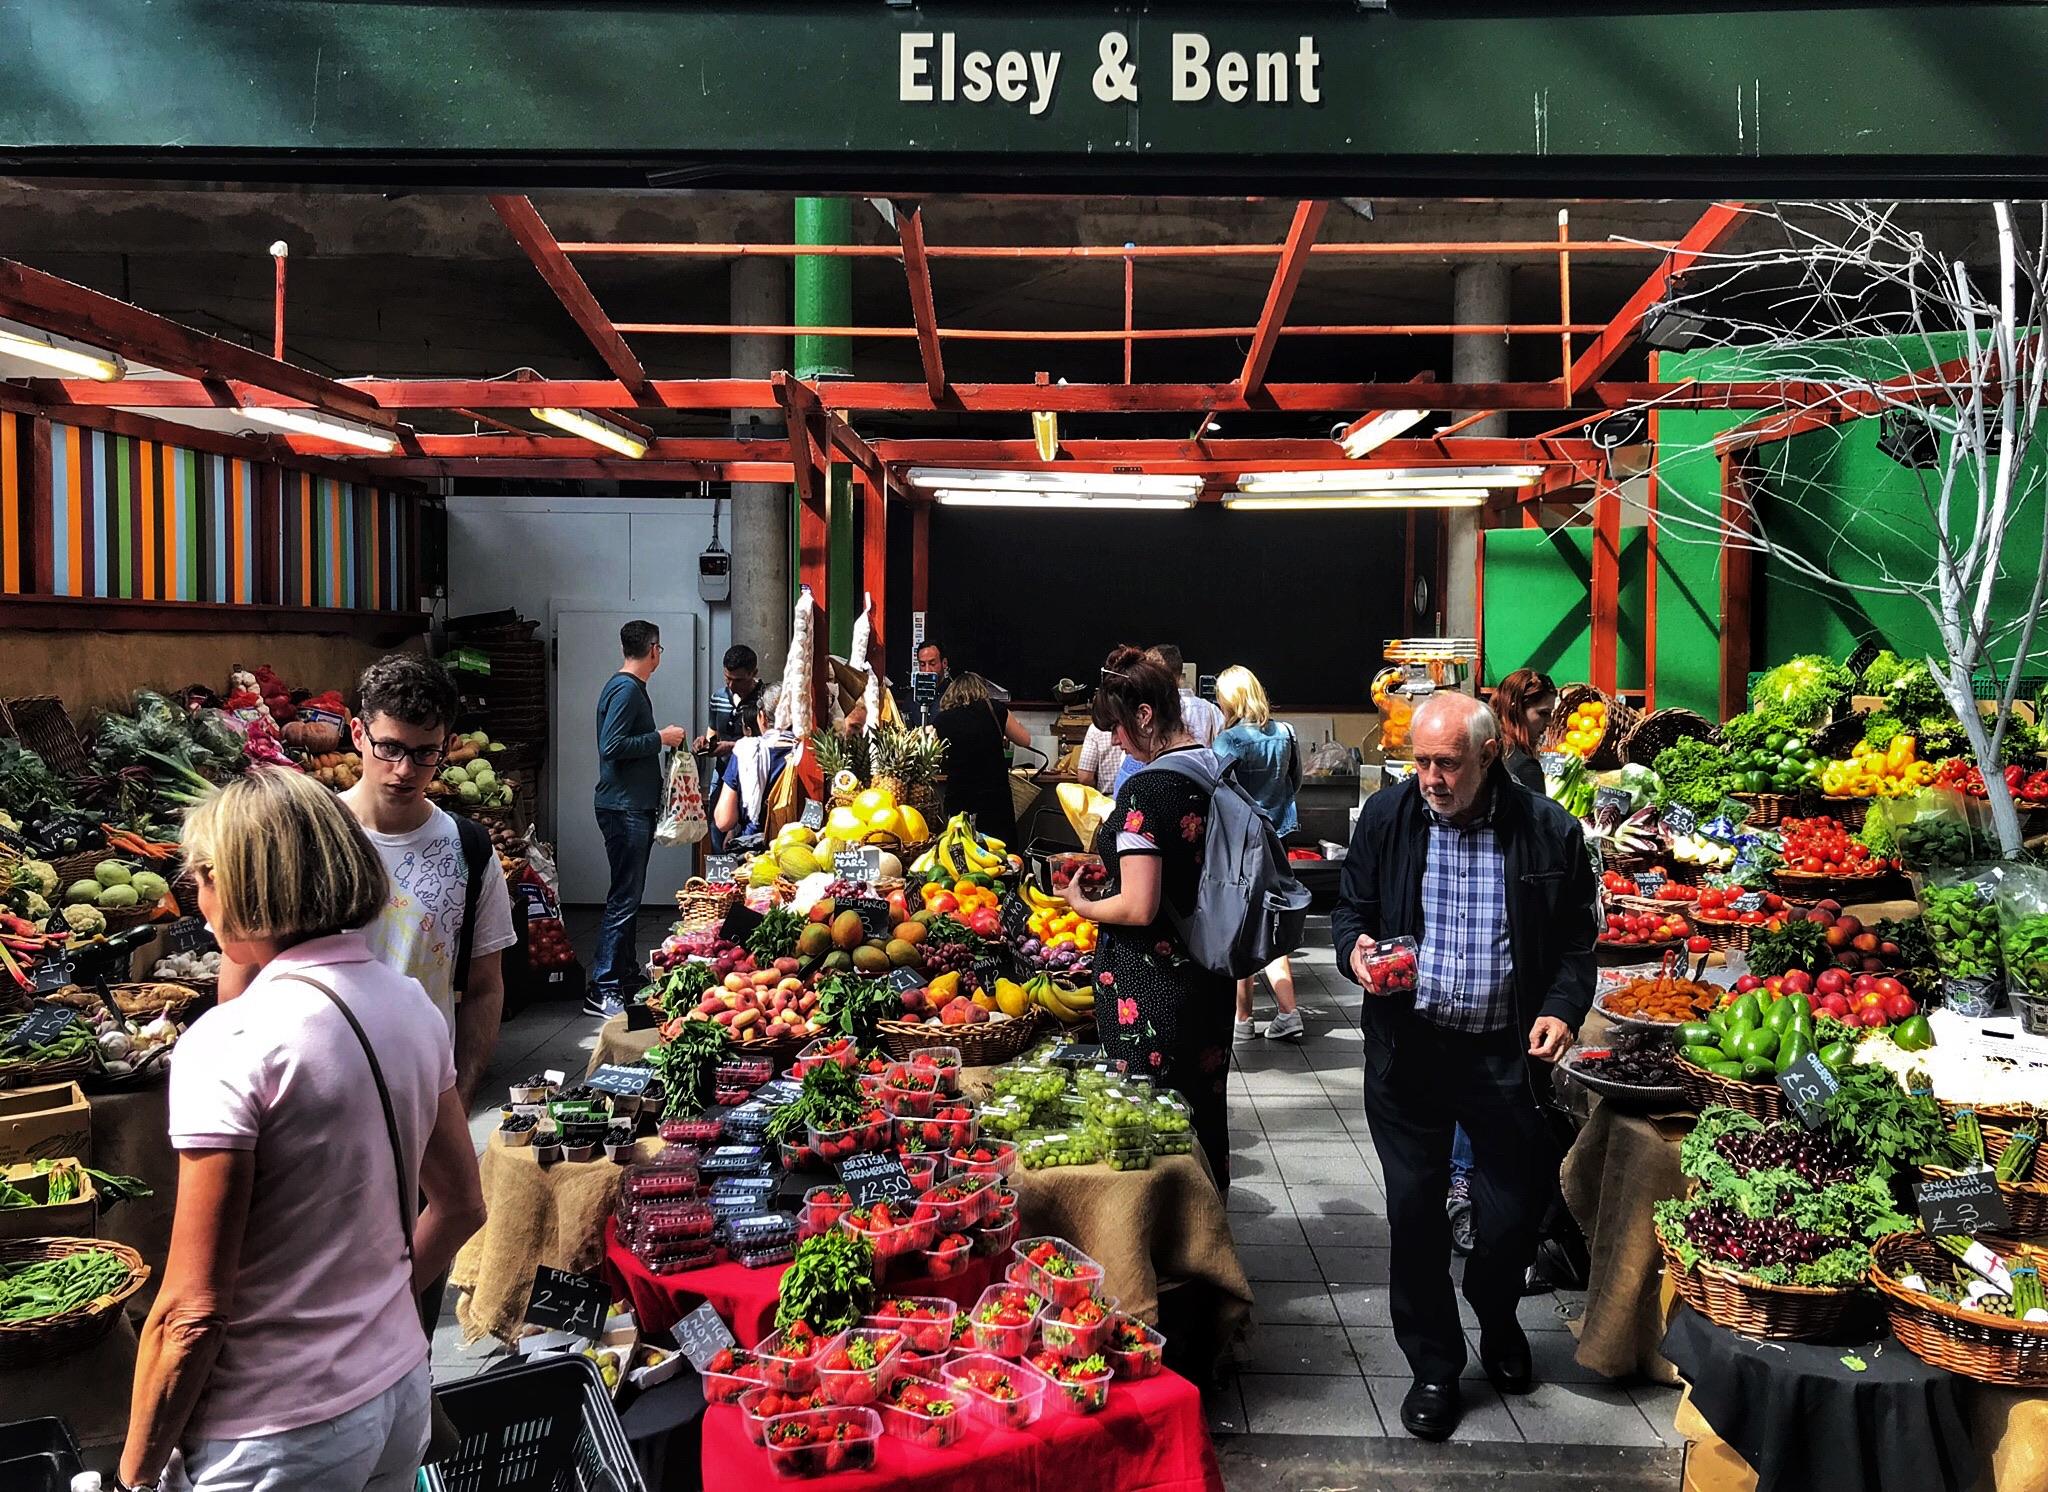 A proper London market!